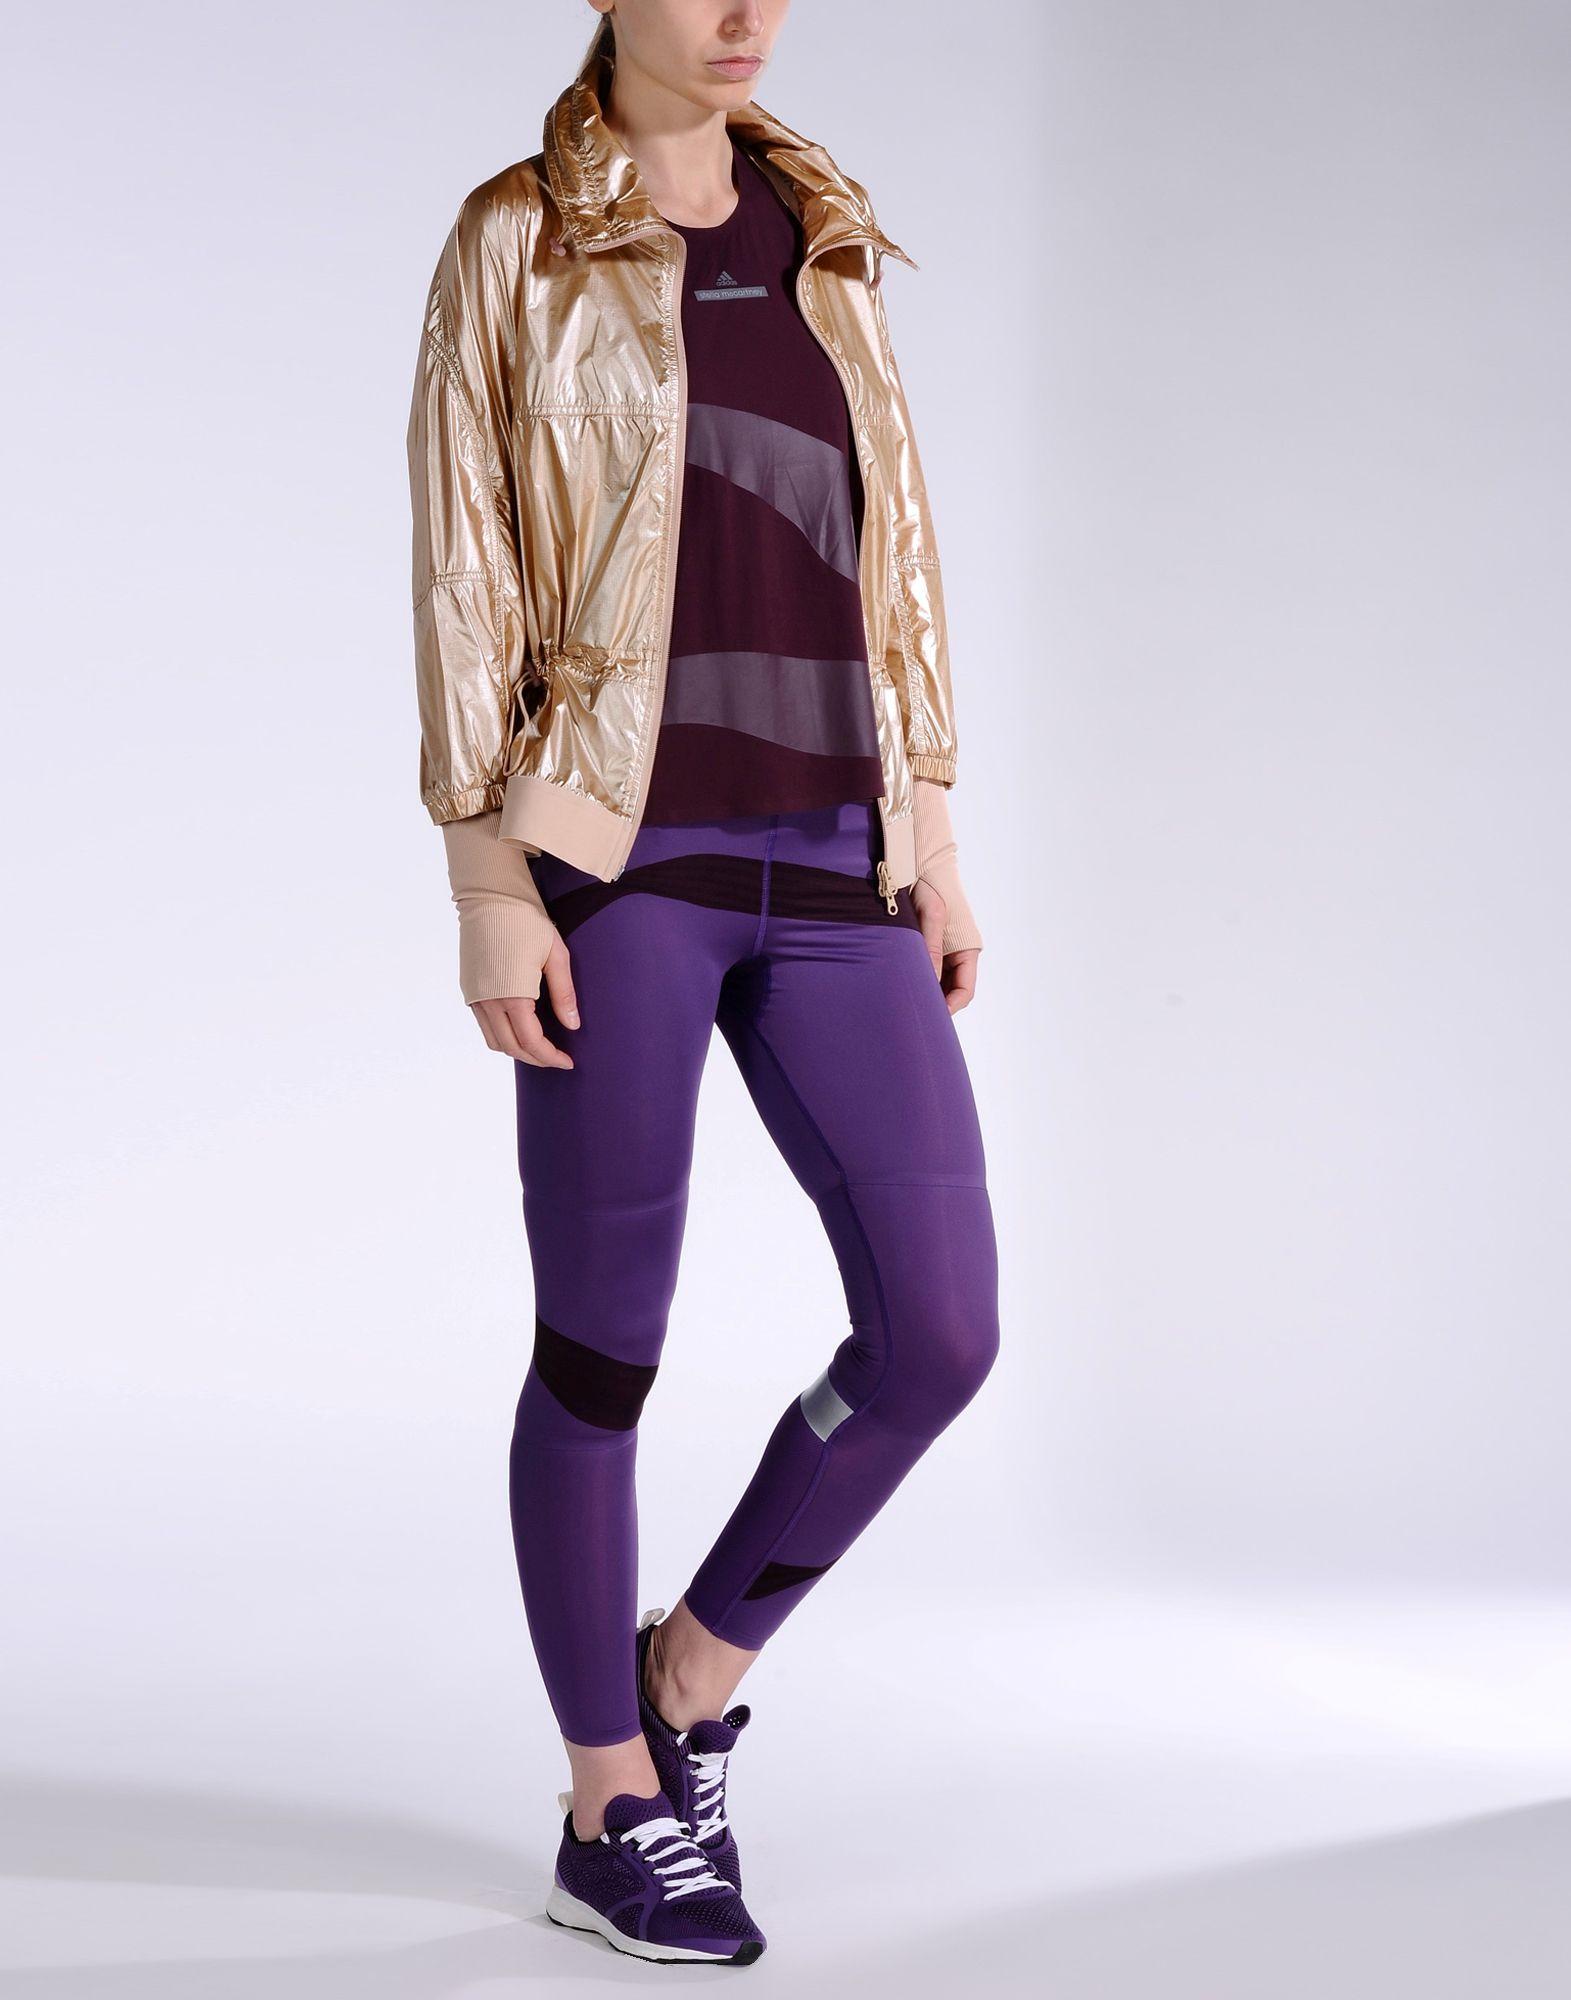 Adidas by stella mccartney run metal jacket 4